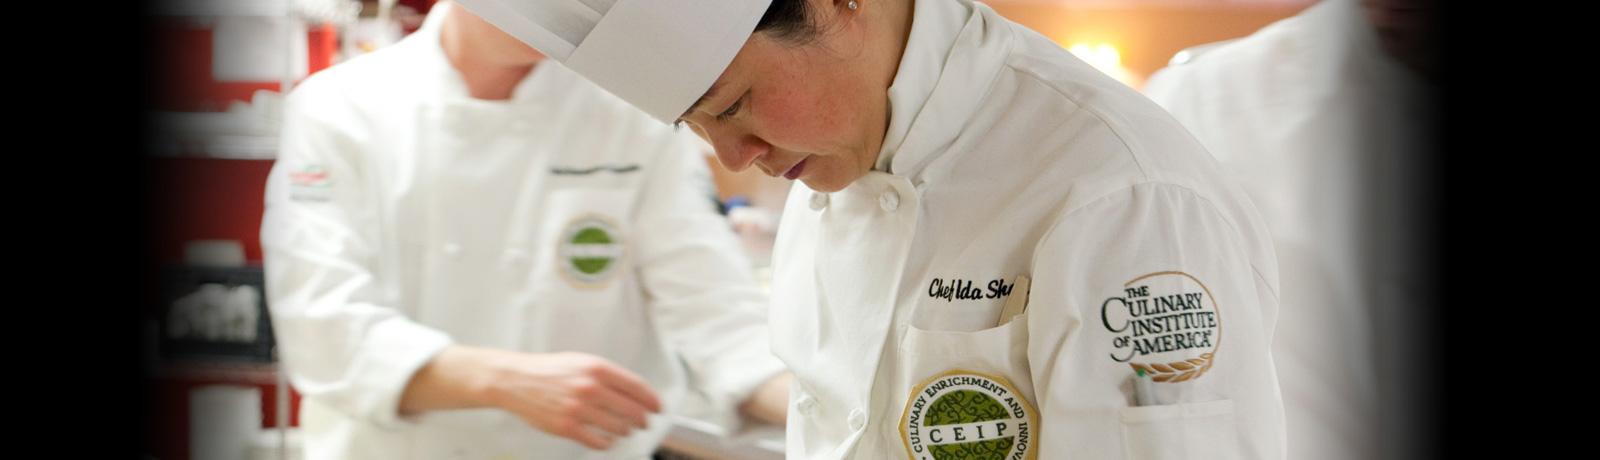 1600x460_chef